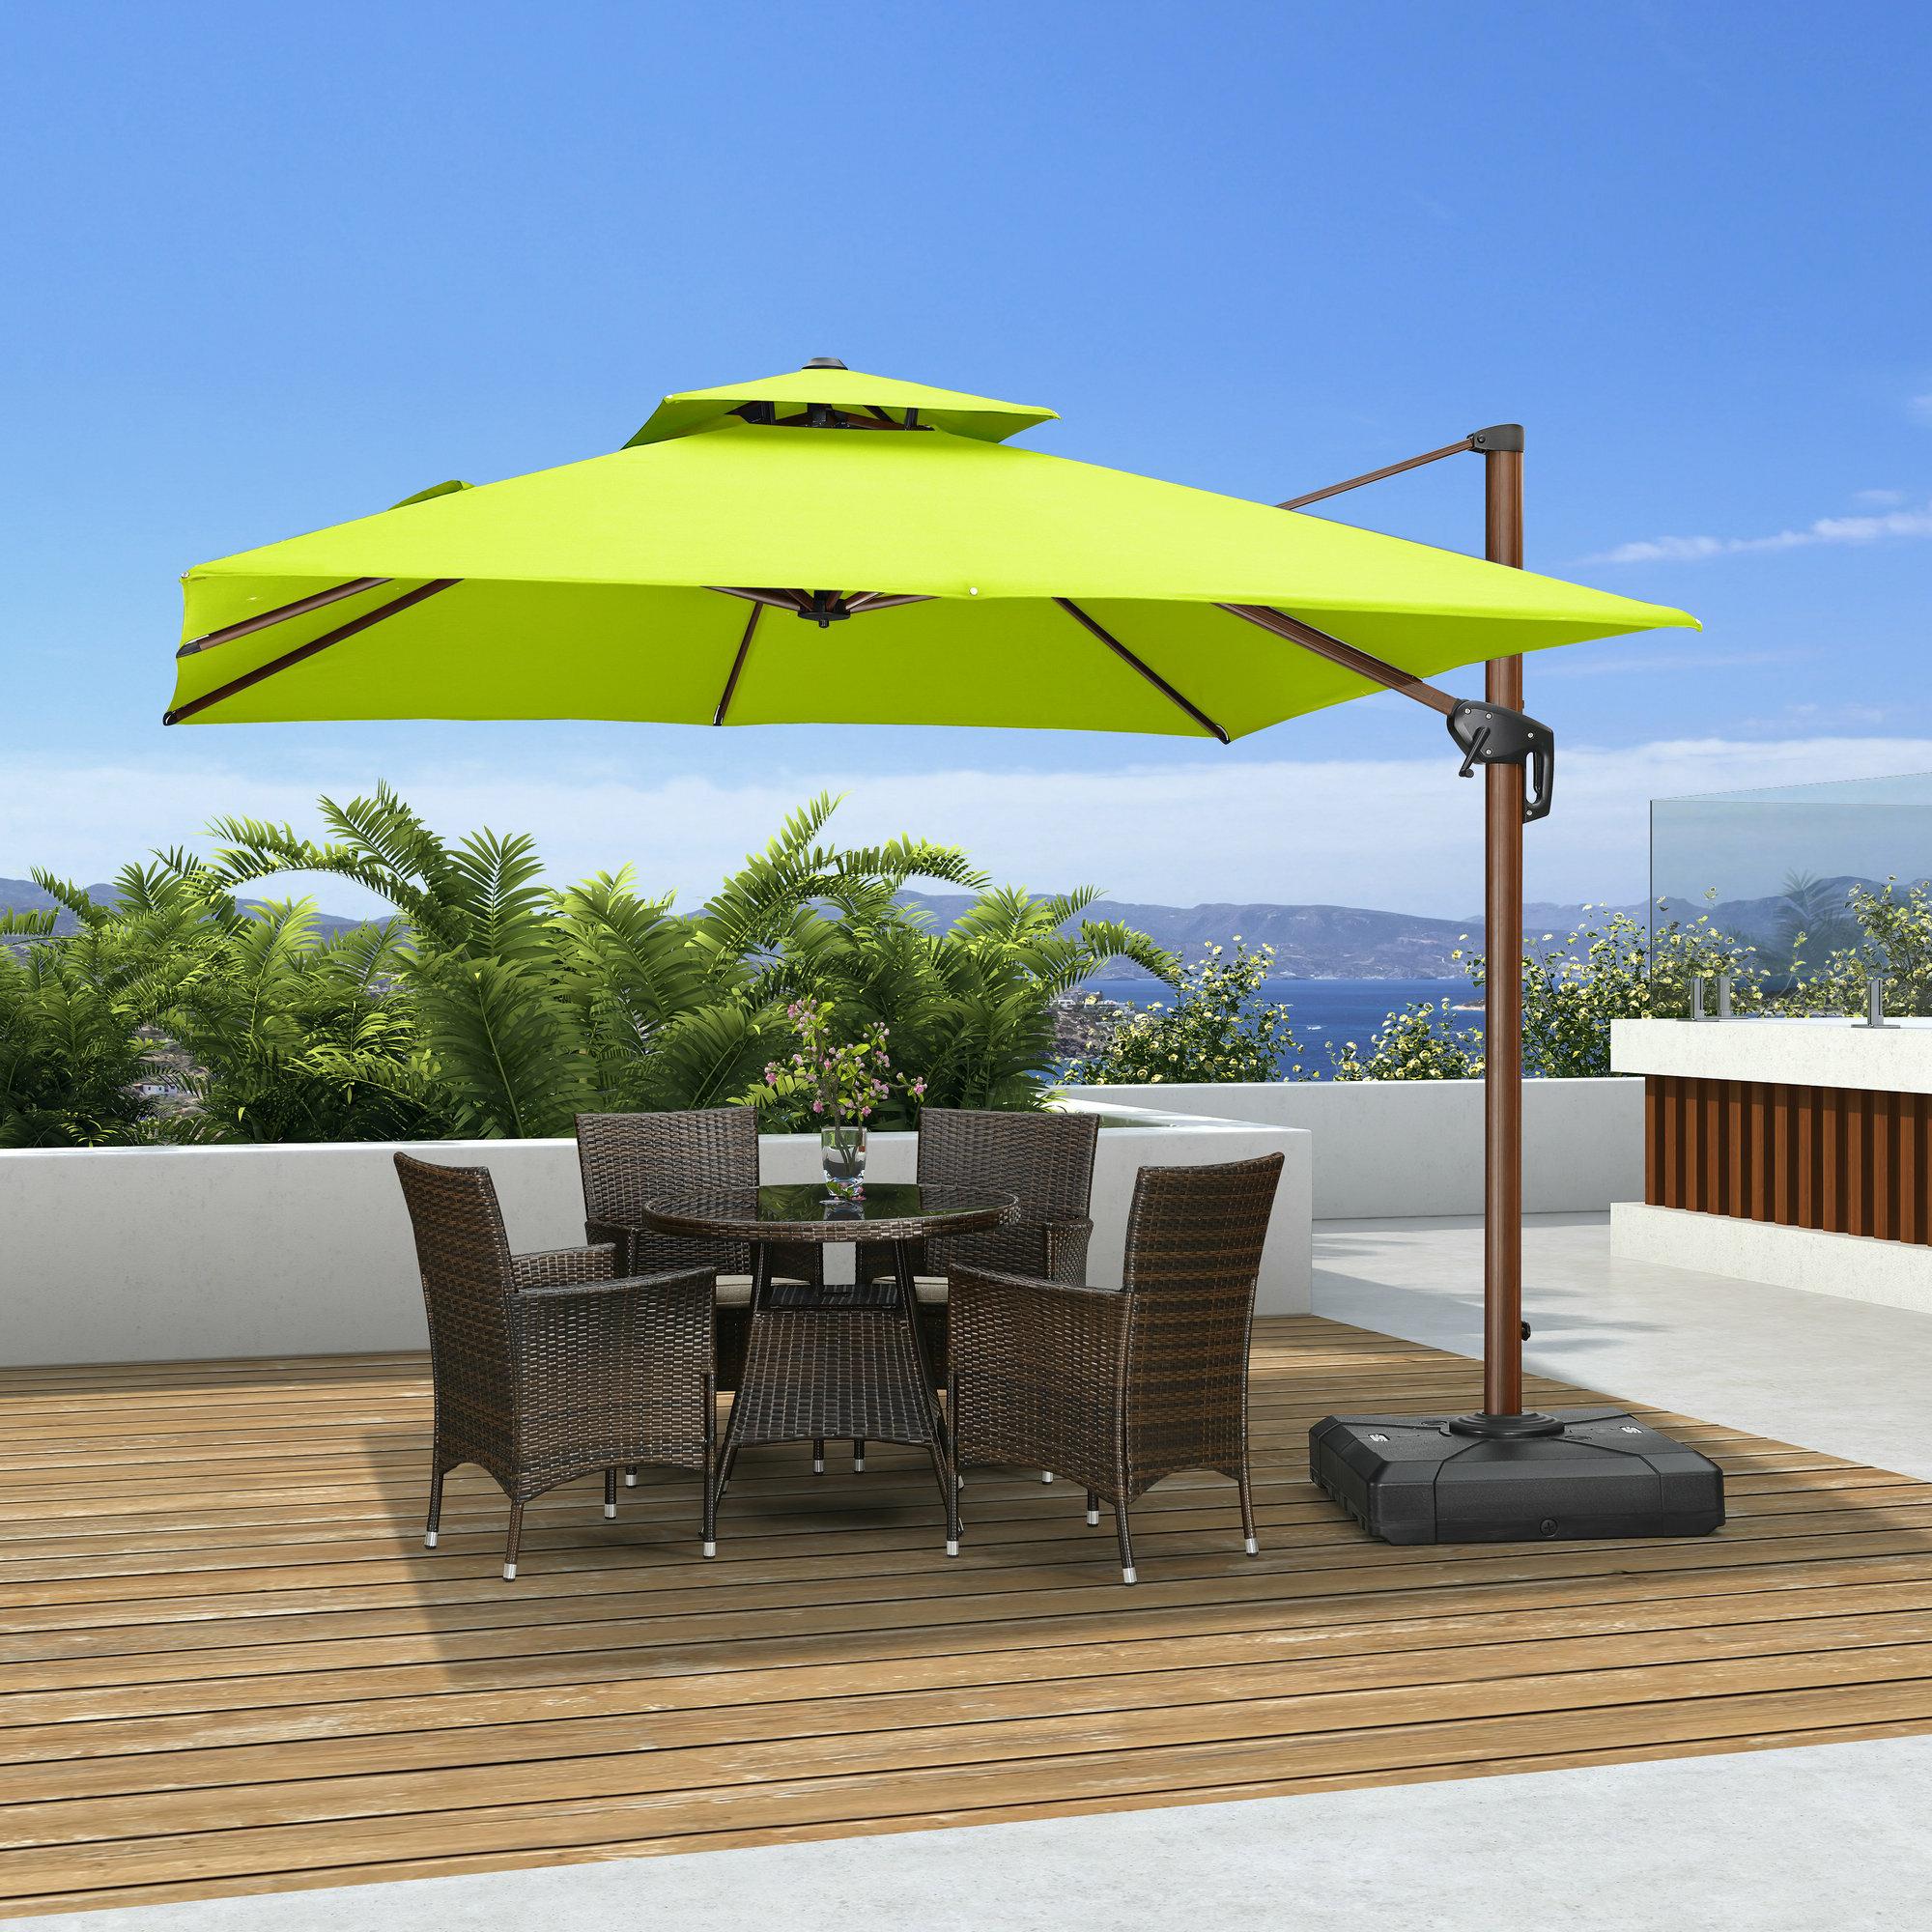 Most Recent Waddell 10' Square Cantilever Umbrella Regarding Lytham Cantilever Umbrellas (View 12 of 20)